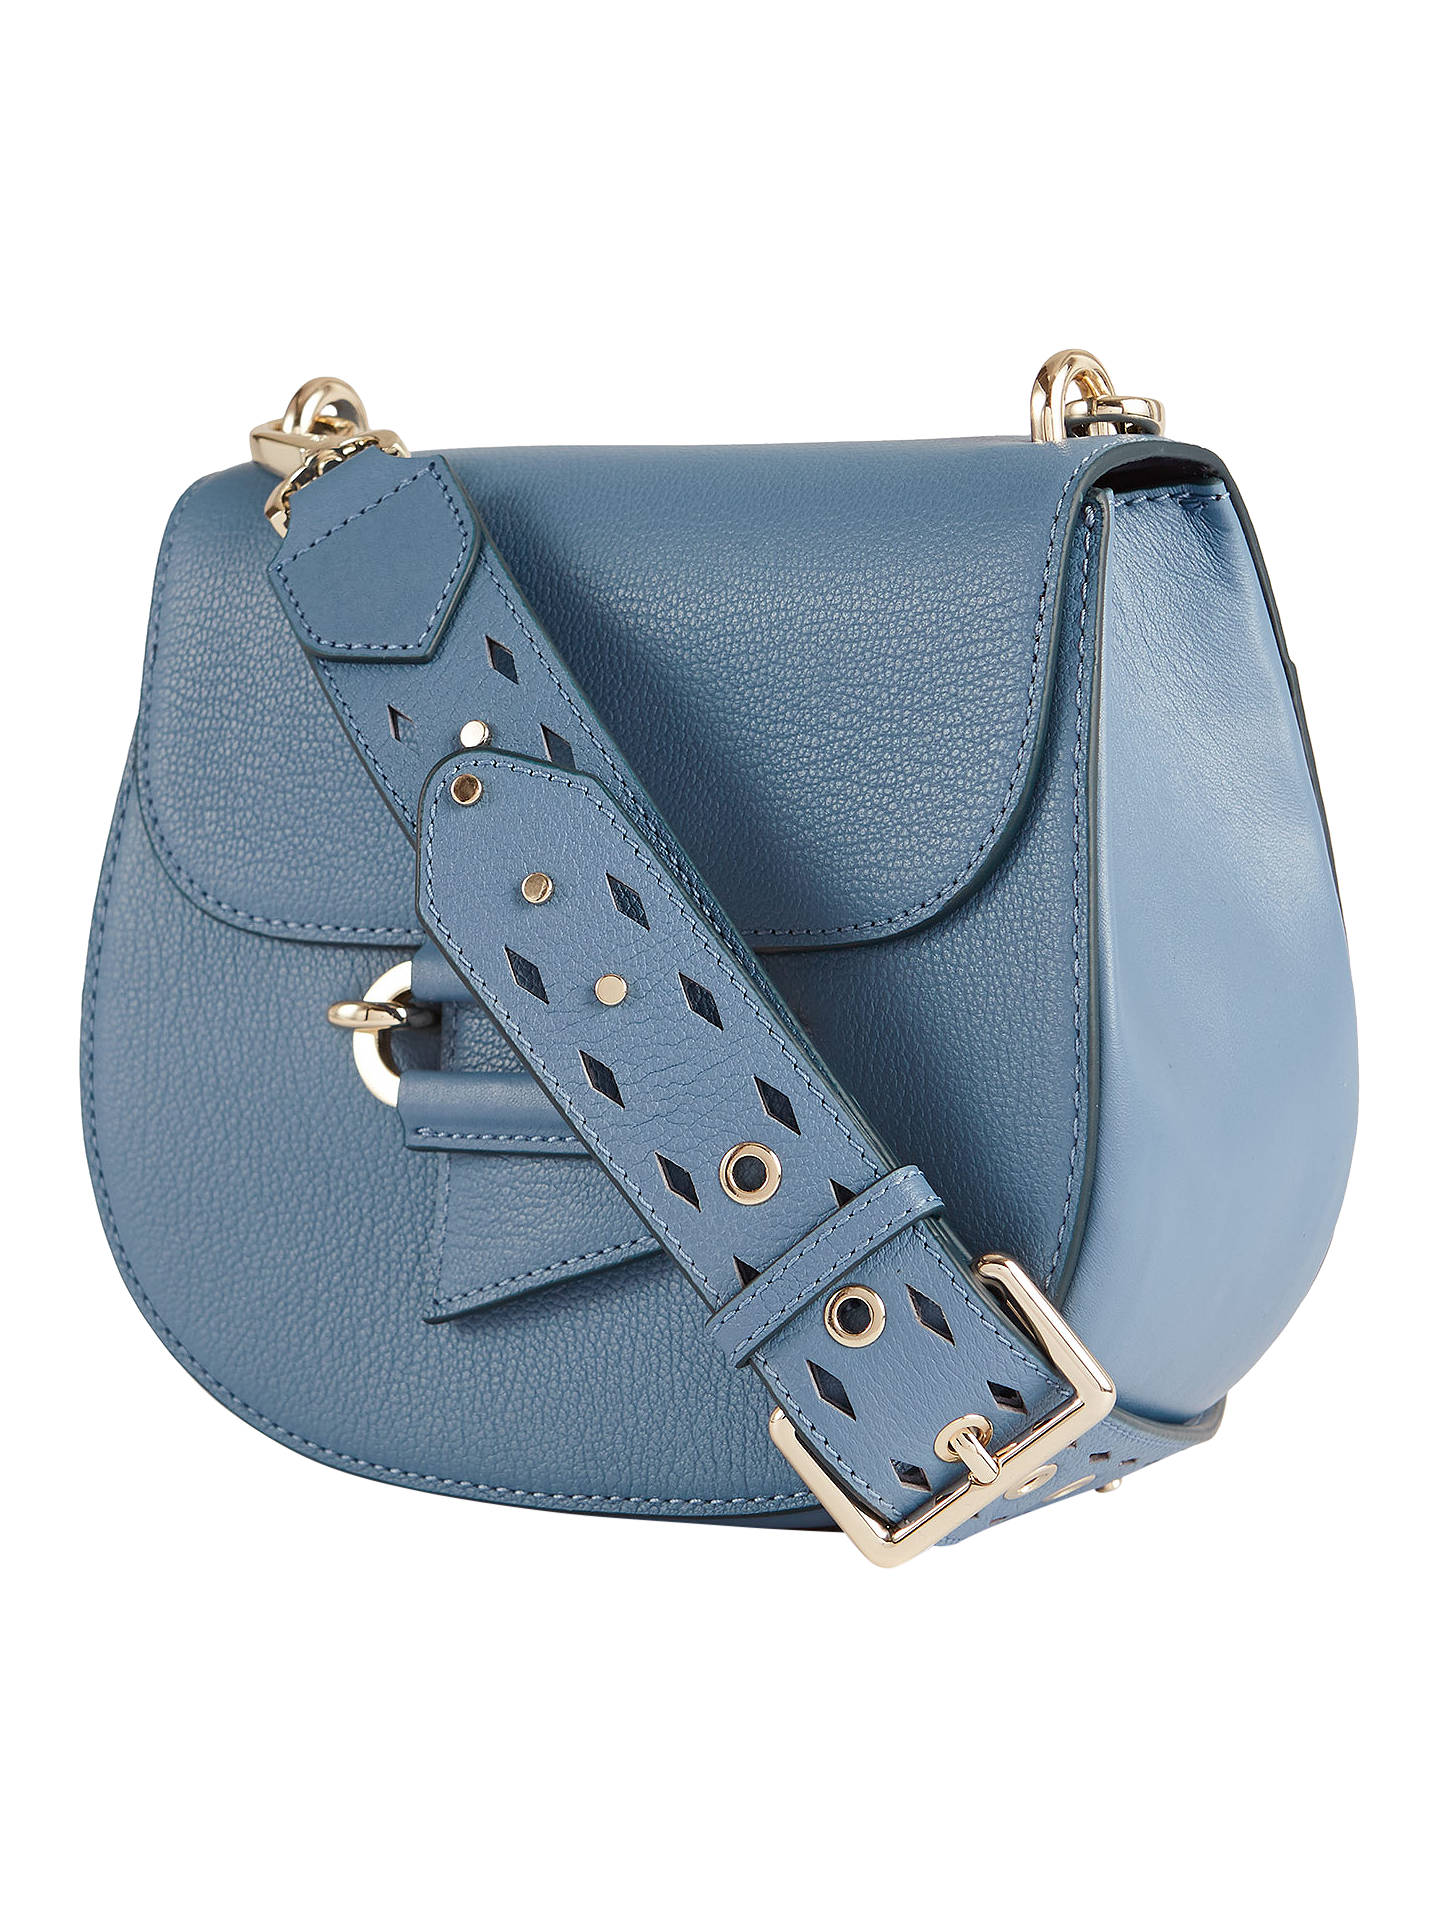 f4e230b393e0 Reiss Maltby Leather Crossbody Bag at John Lewis   Partners